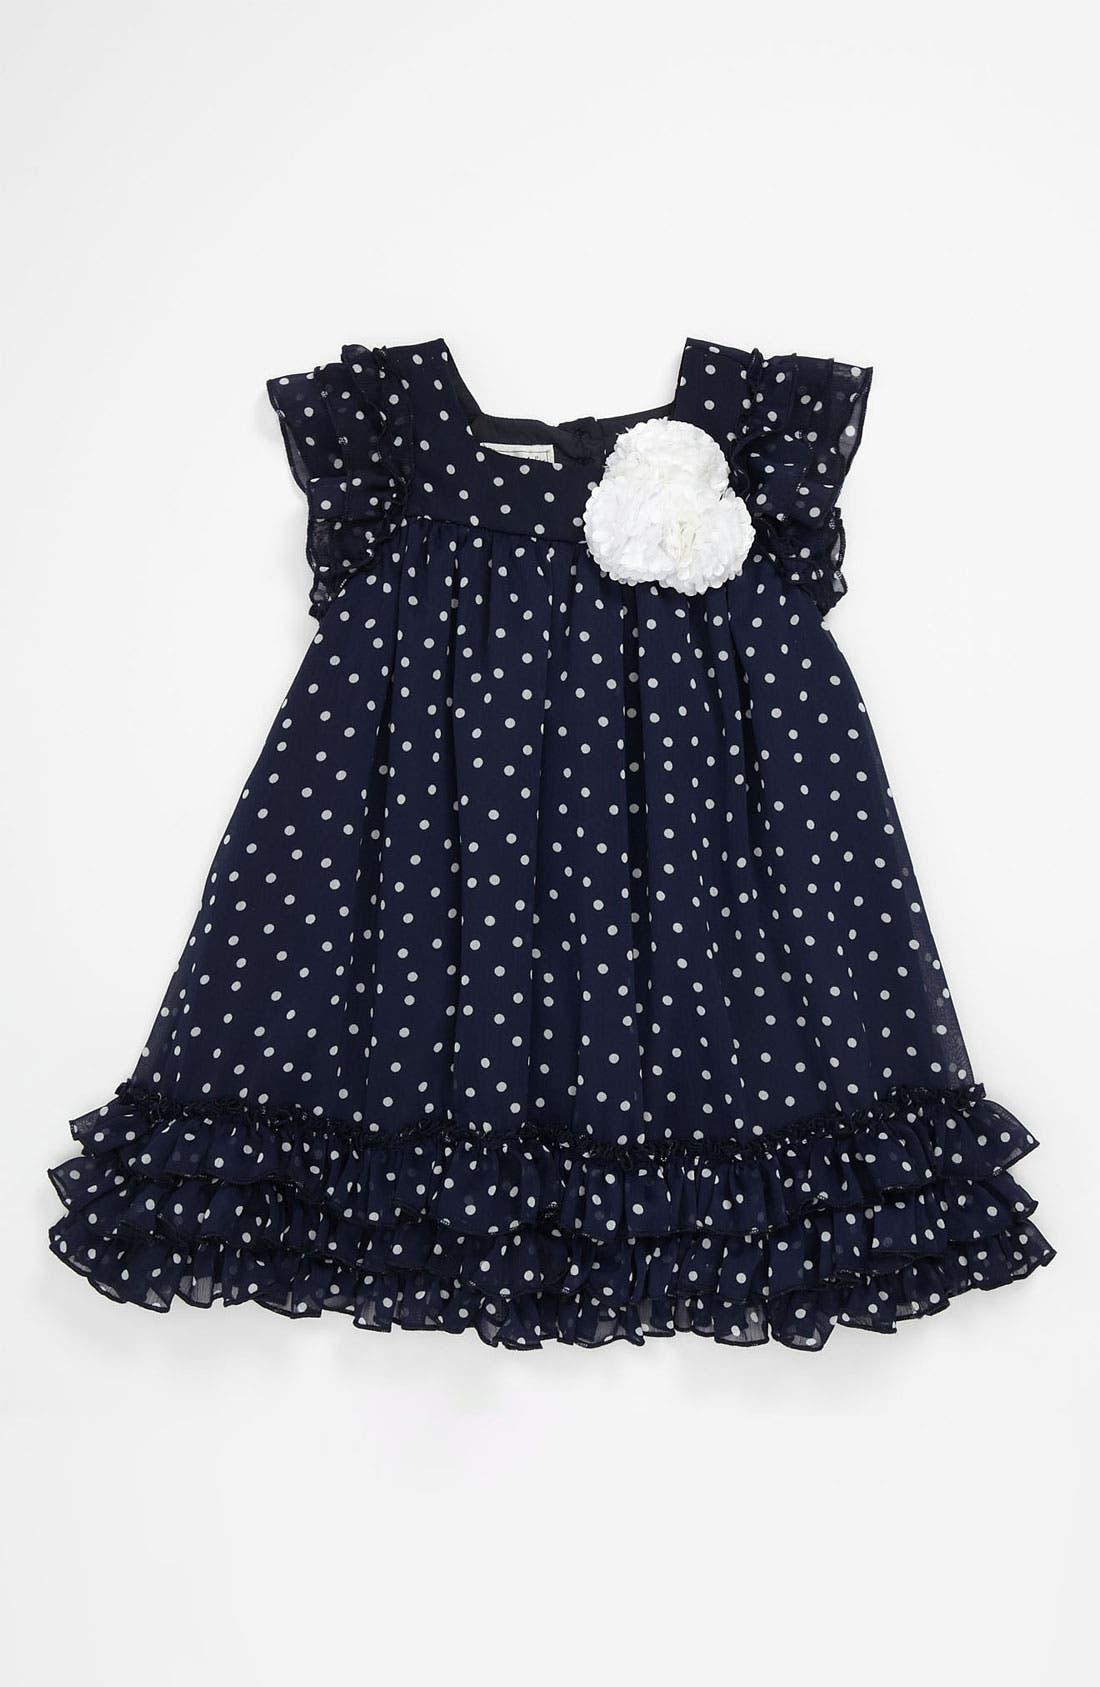 Alternate Image 1 Selected - Pippa & Julie Polka Dot Dress (Toddler)